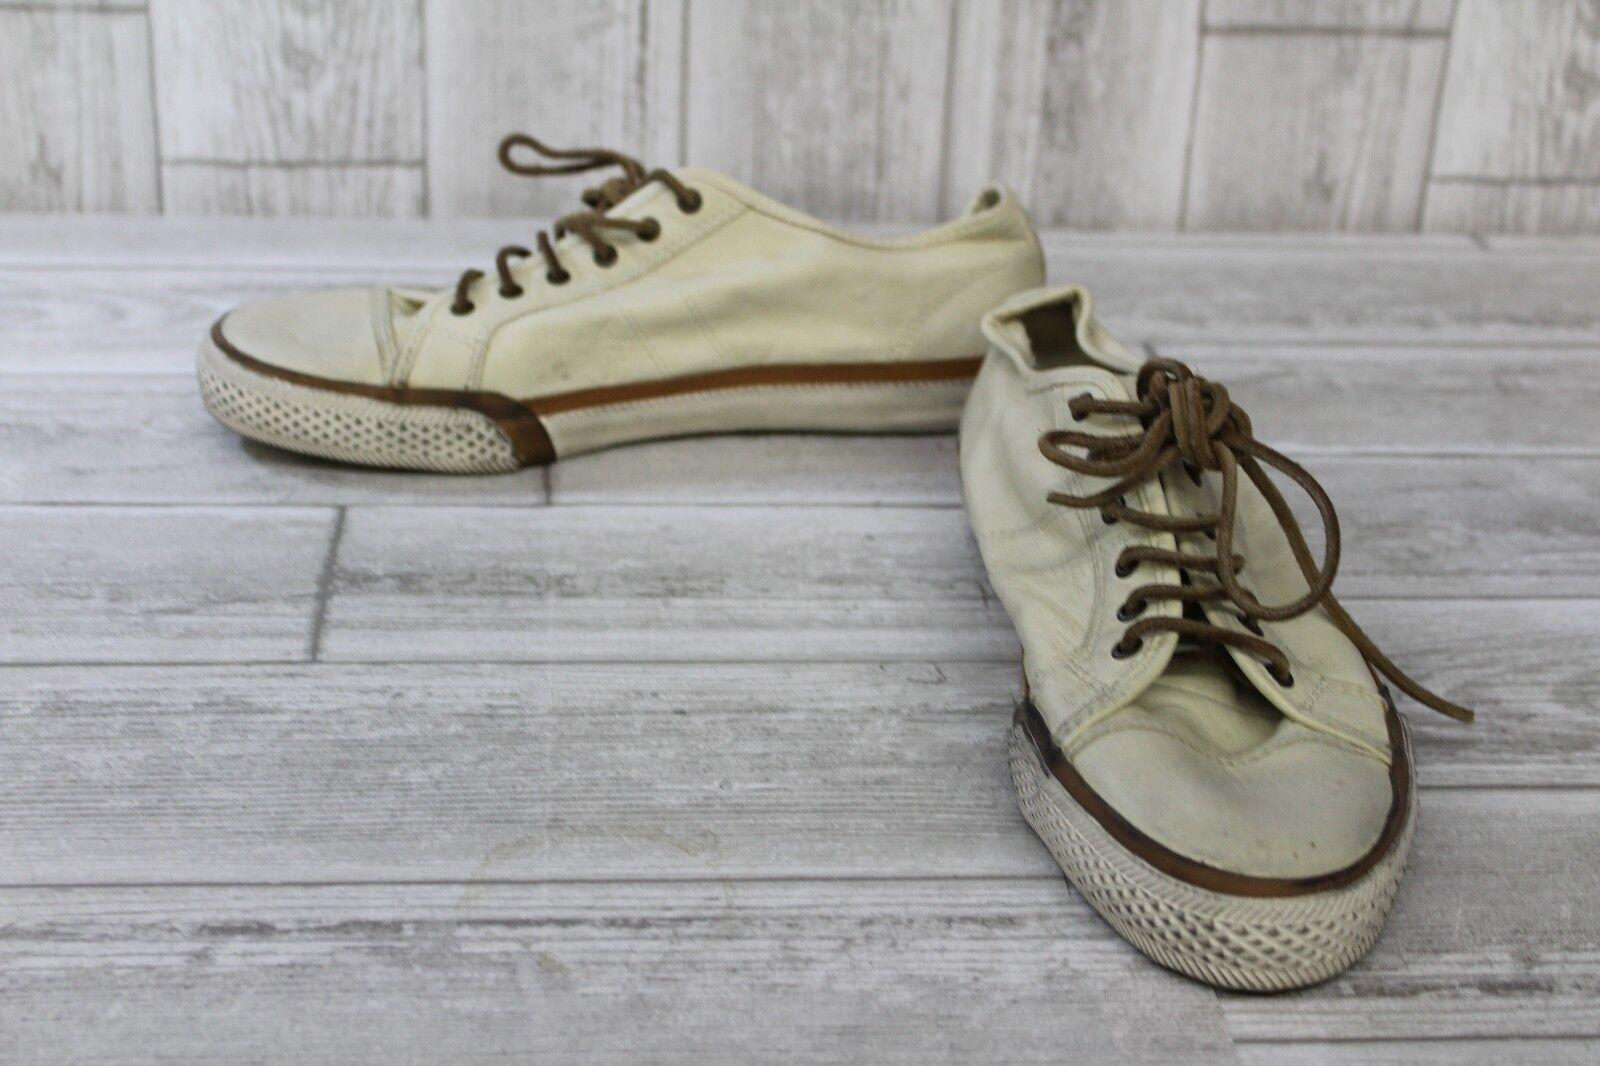 **Frye Greene 71181 Low Lace Sneakers - Women's Size 9M, Off White/Brown